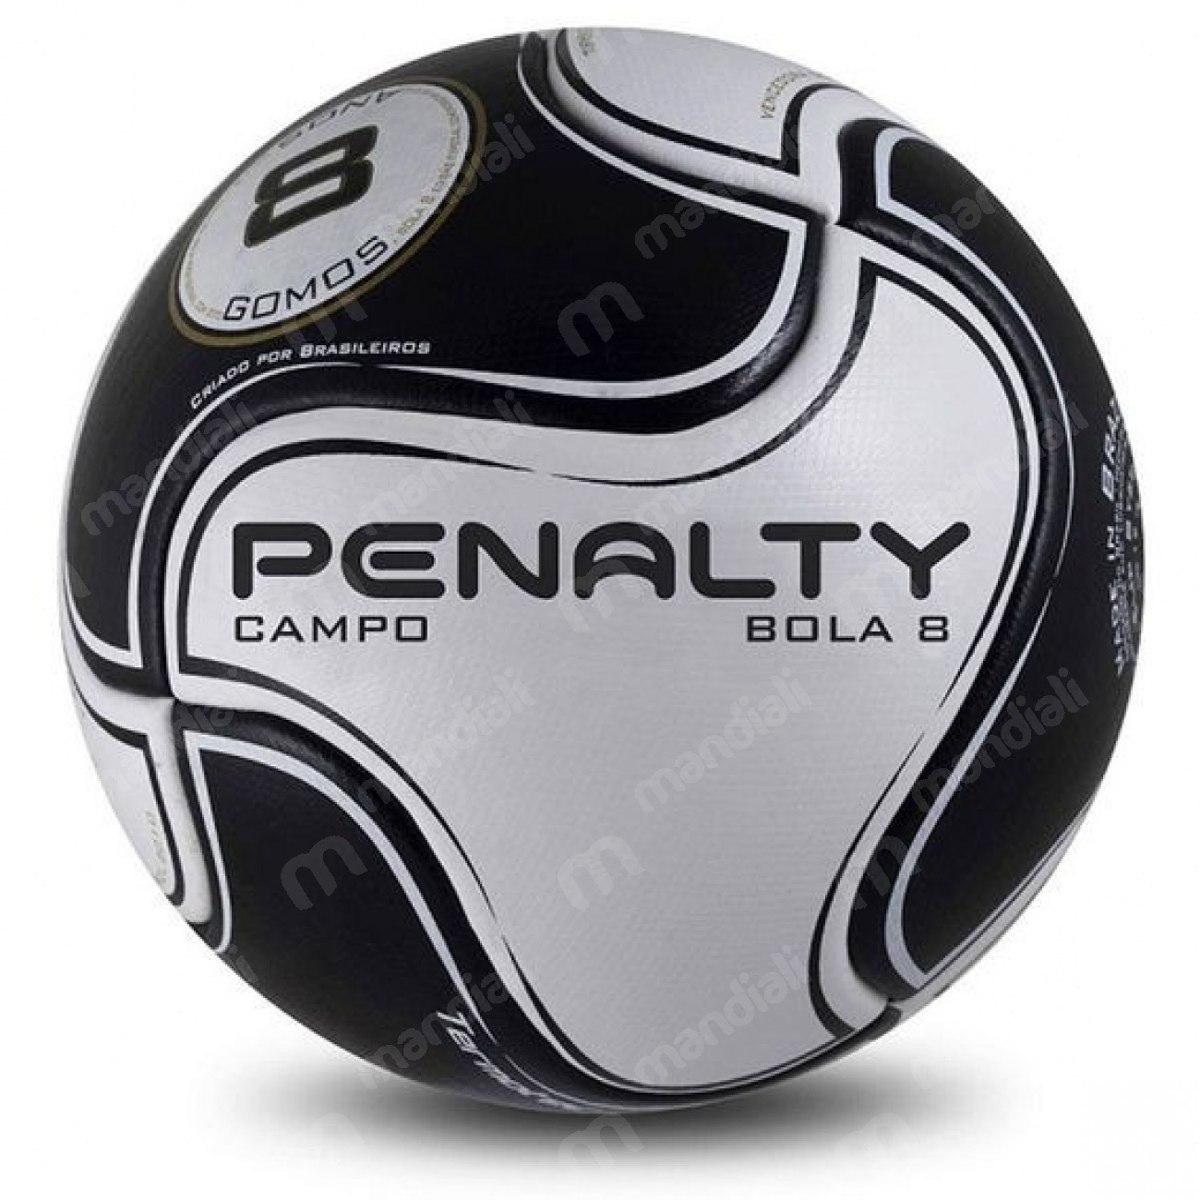 bola futebol campo semi profissional r2 8 s11 preta penalty. Carregando  zoom. 10cdbd6c825b3